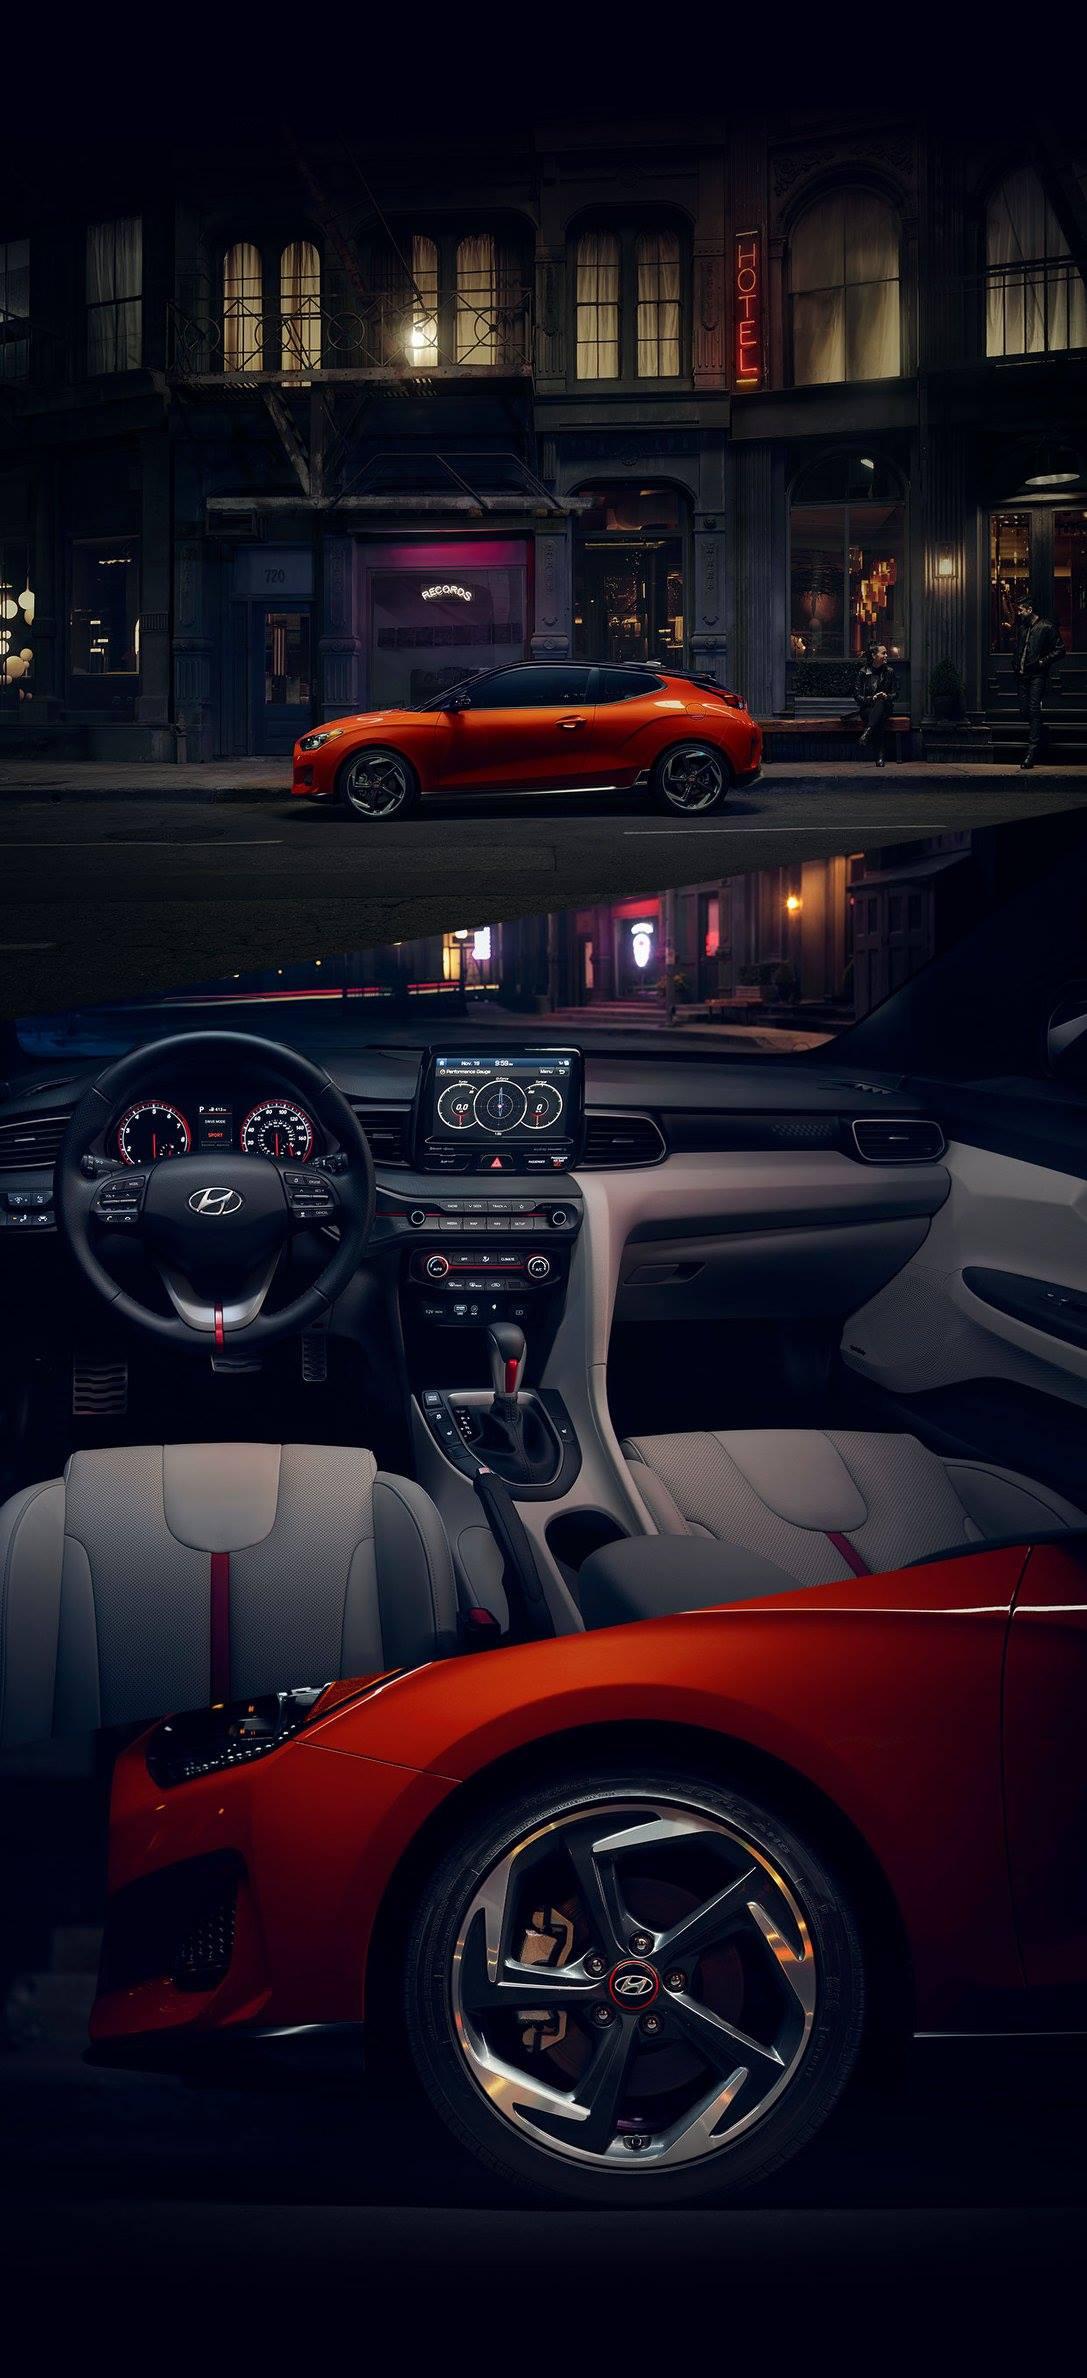 Hyundai Veloster N and turbo photos (6)